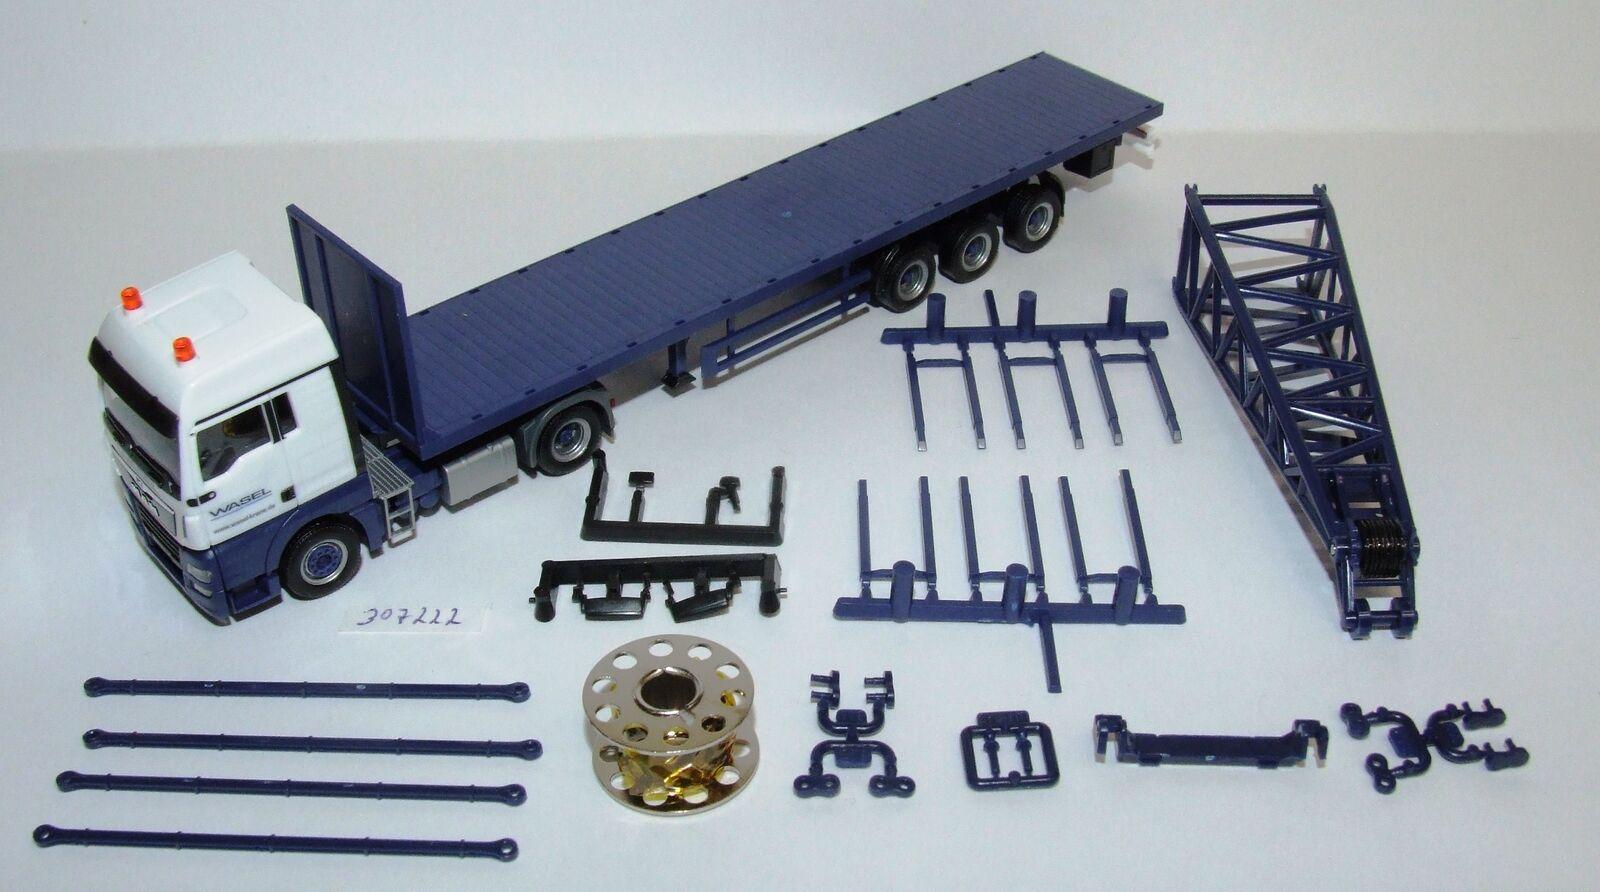 Herpa 307222 Man Tgx Xlx 6c Flatbed Semitrailer with Headpiece Wasel 1 87